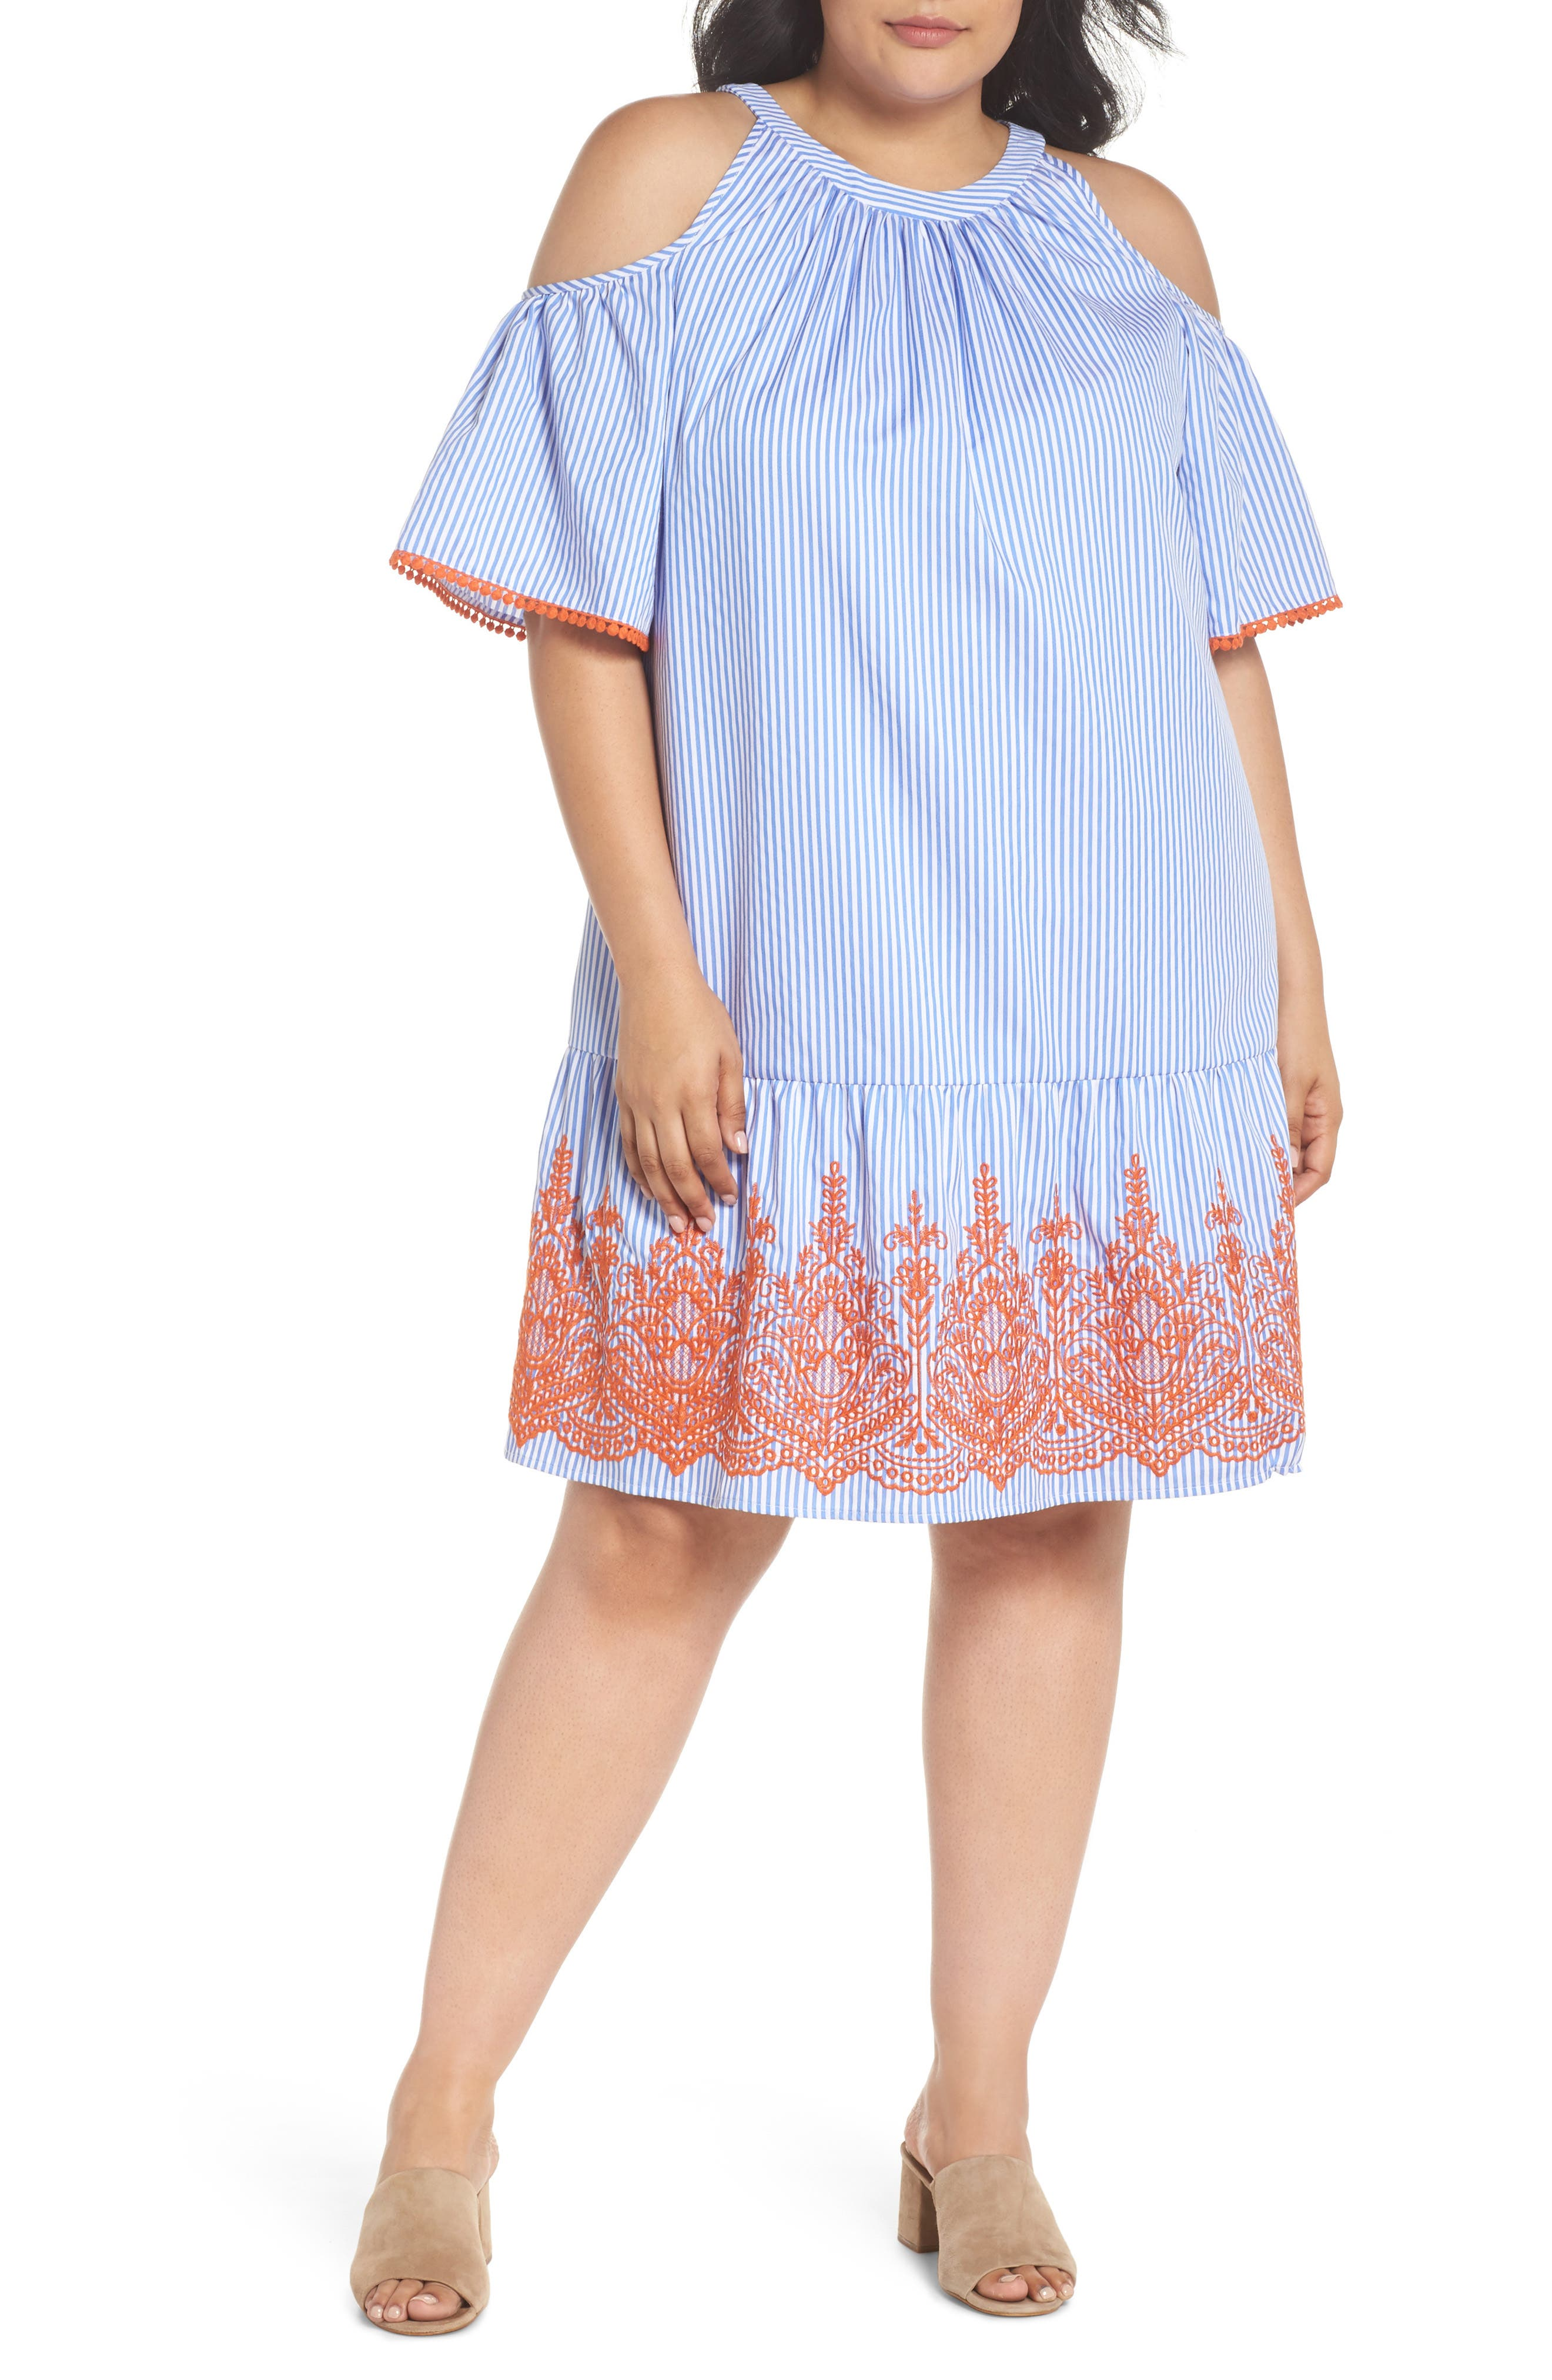 Embroidered Stripe Cold Shoulder Shift Dress,                             Main thumbnail 1, color,                             Blue/ White/ Orange